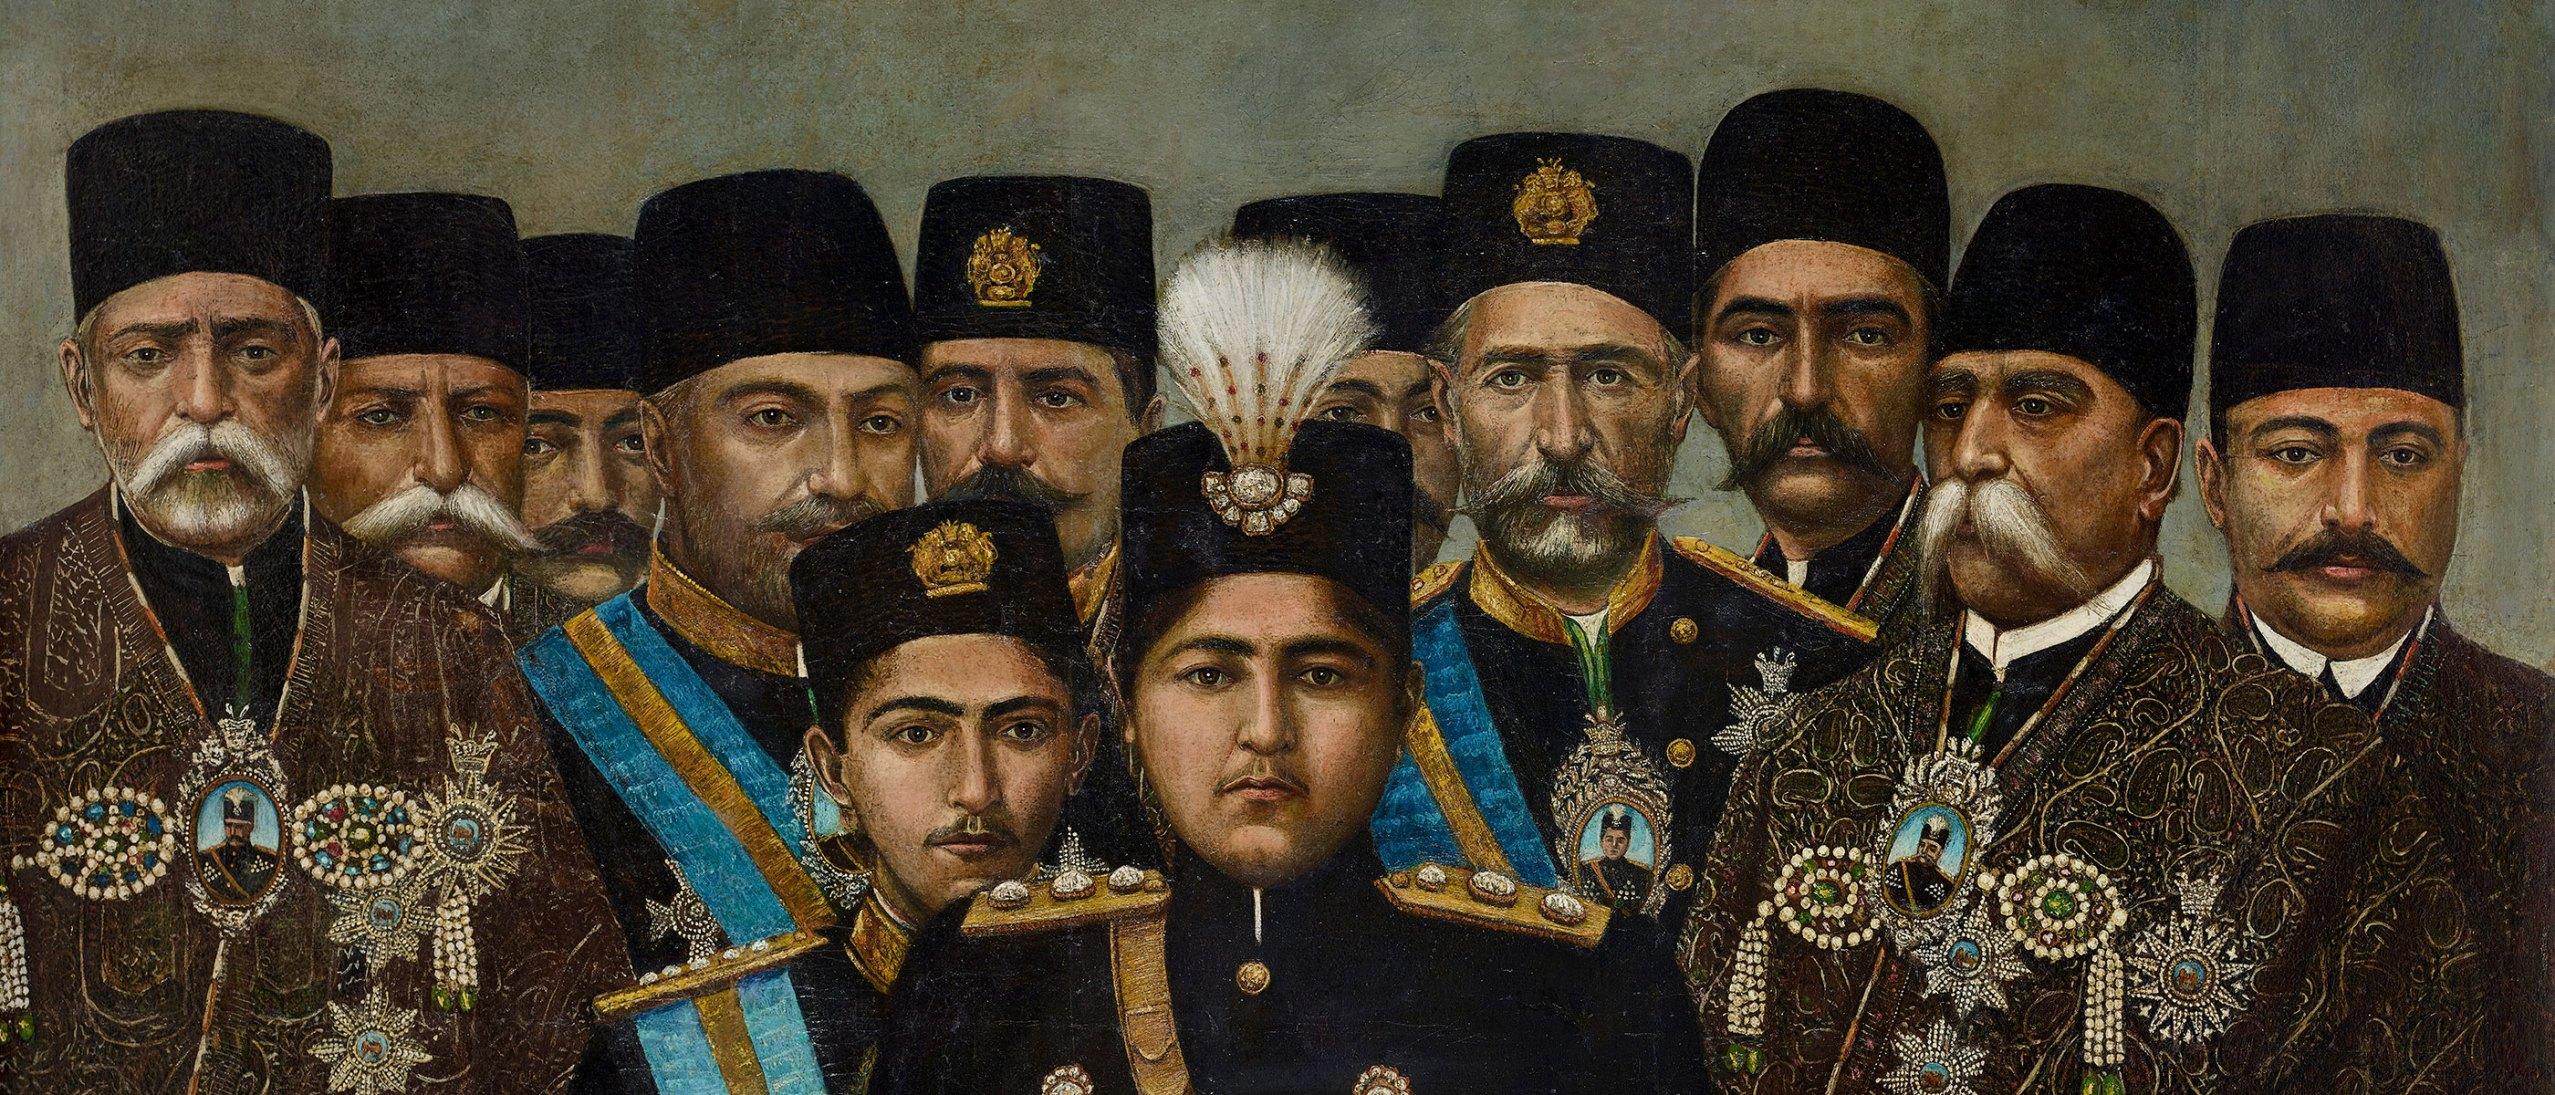 the prince and the shah royal portraits from qajar iran freer sackler